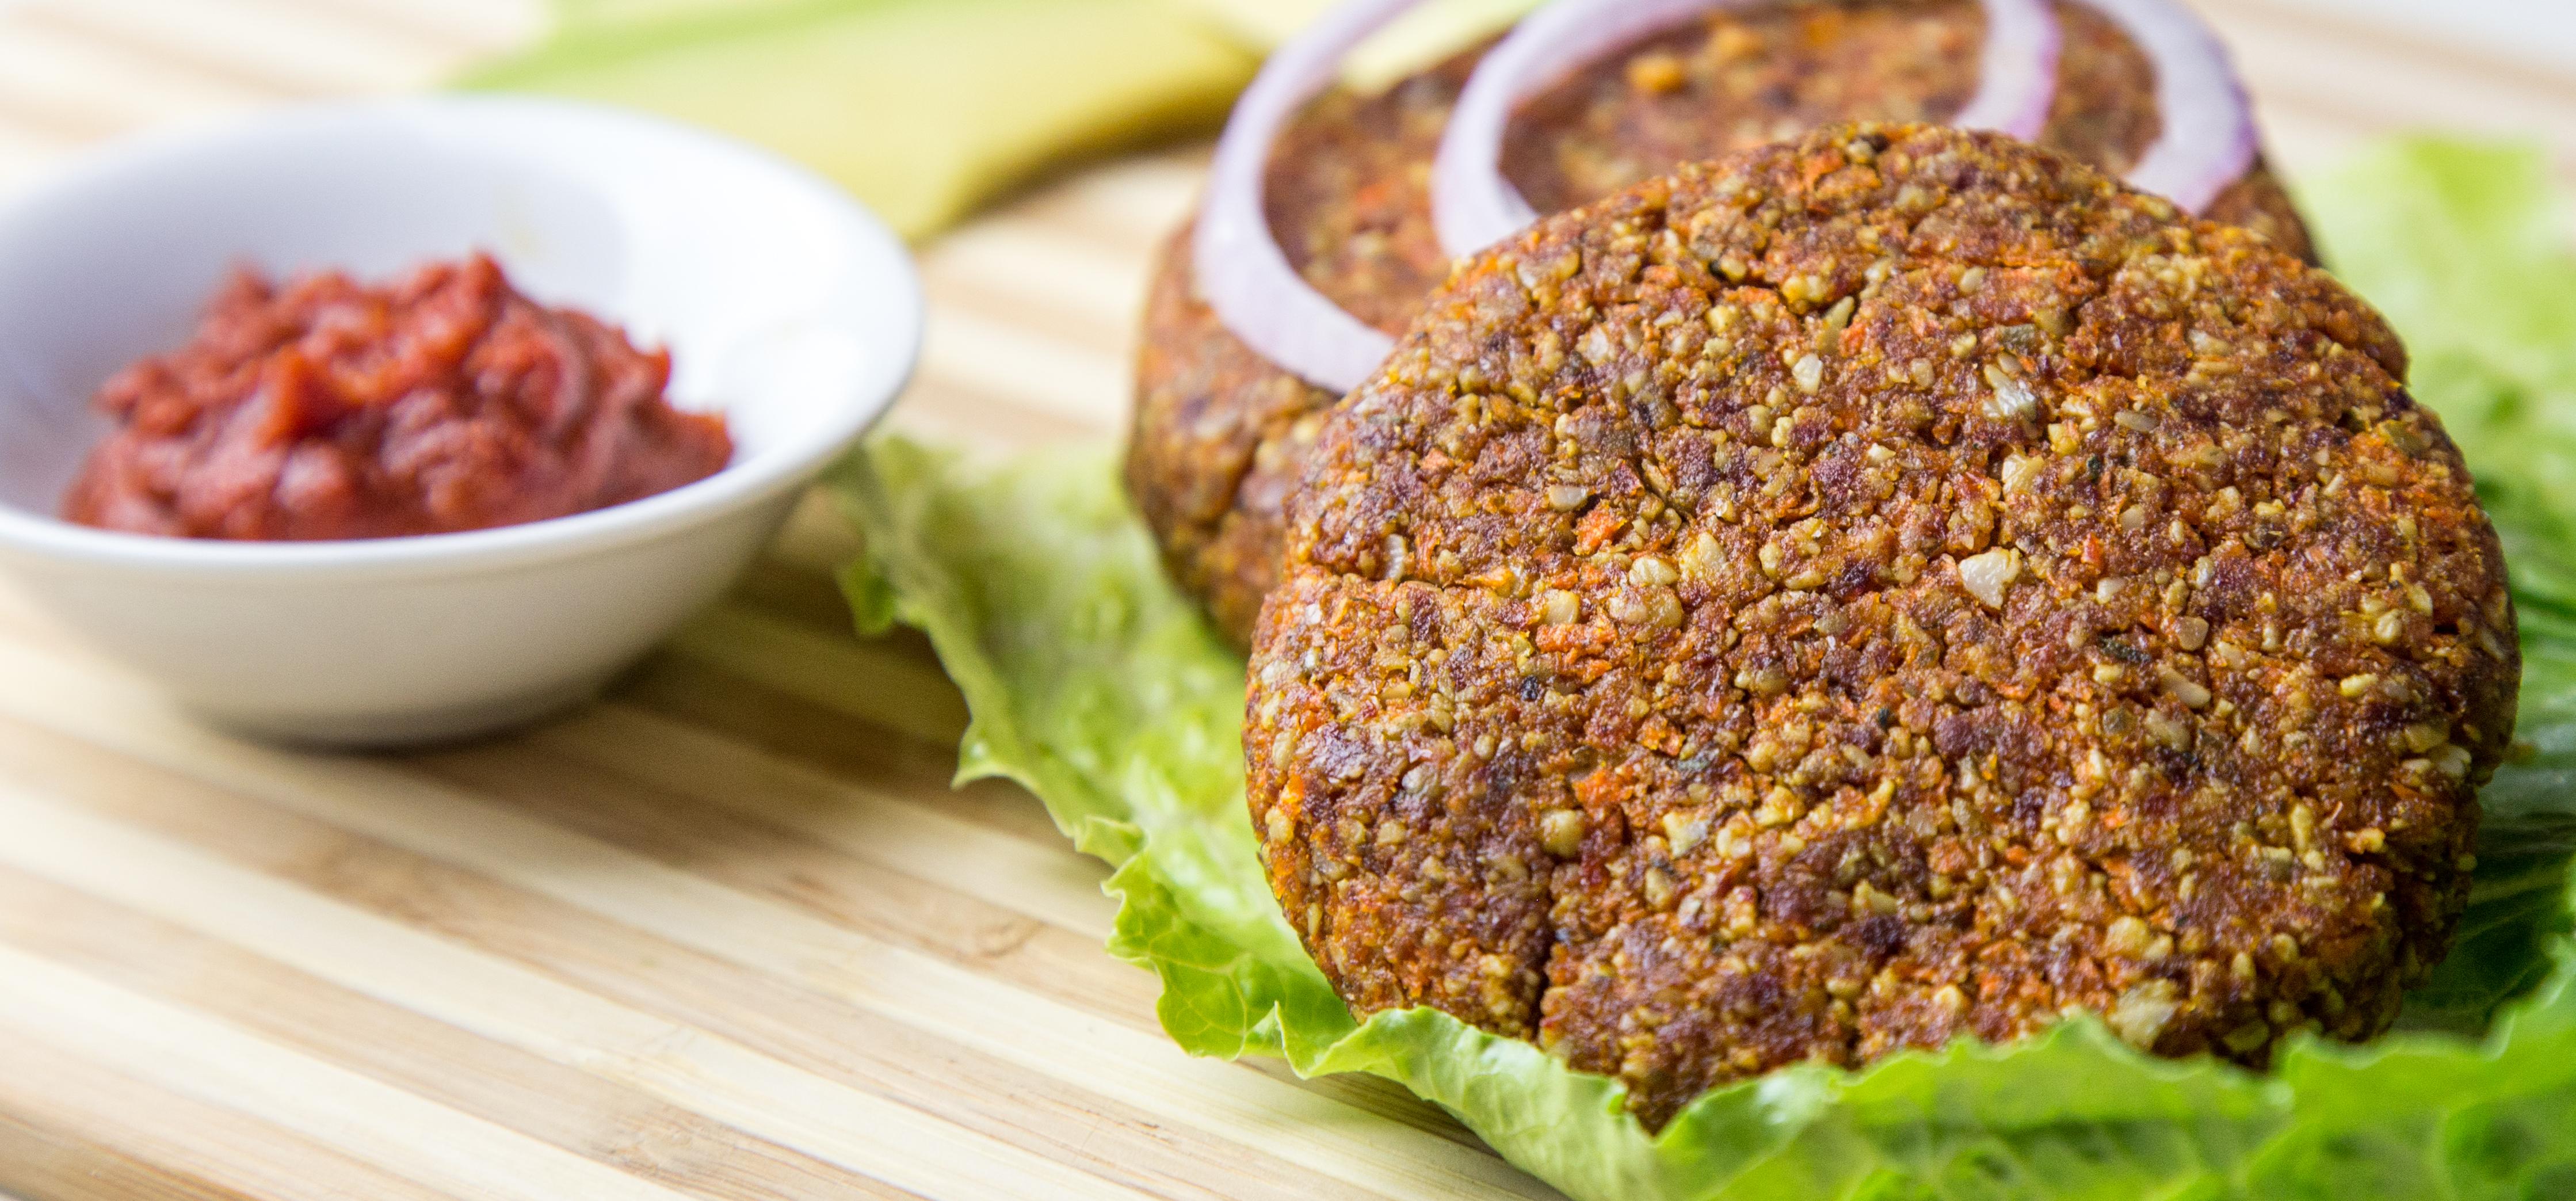 Grain Free Magnesium Rich Vegan Burgers